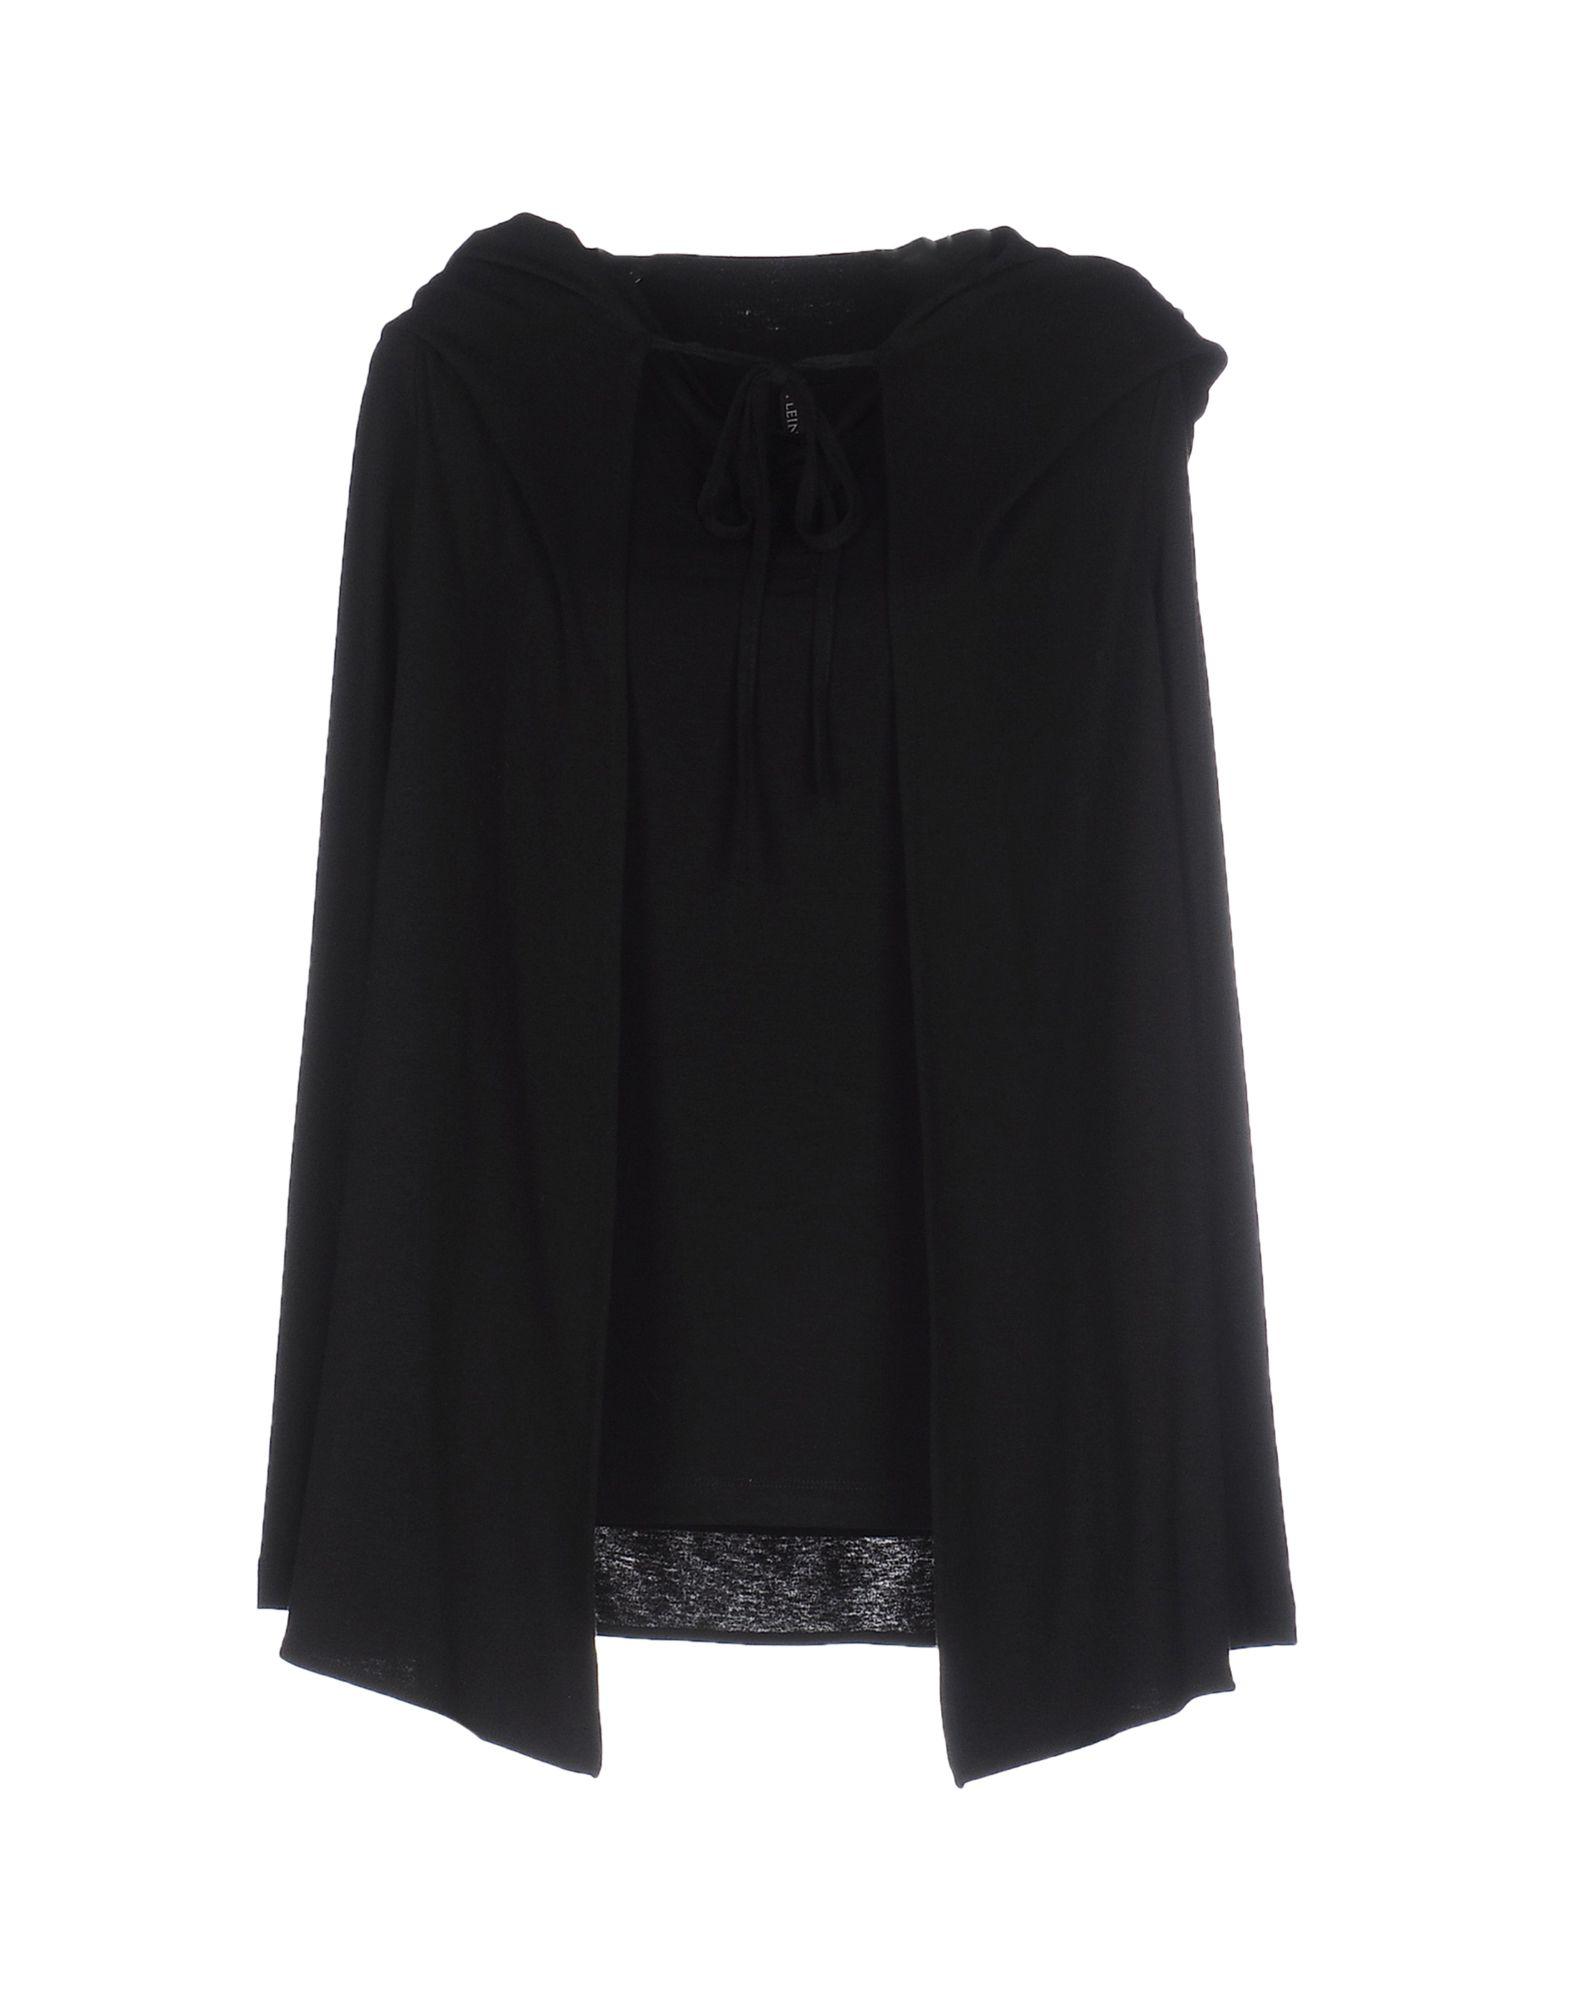 PLEIN SUD JEANIUS Sweater in Black